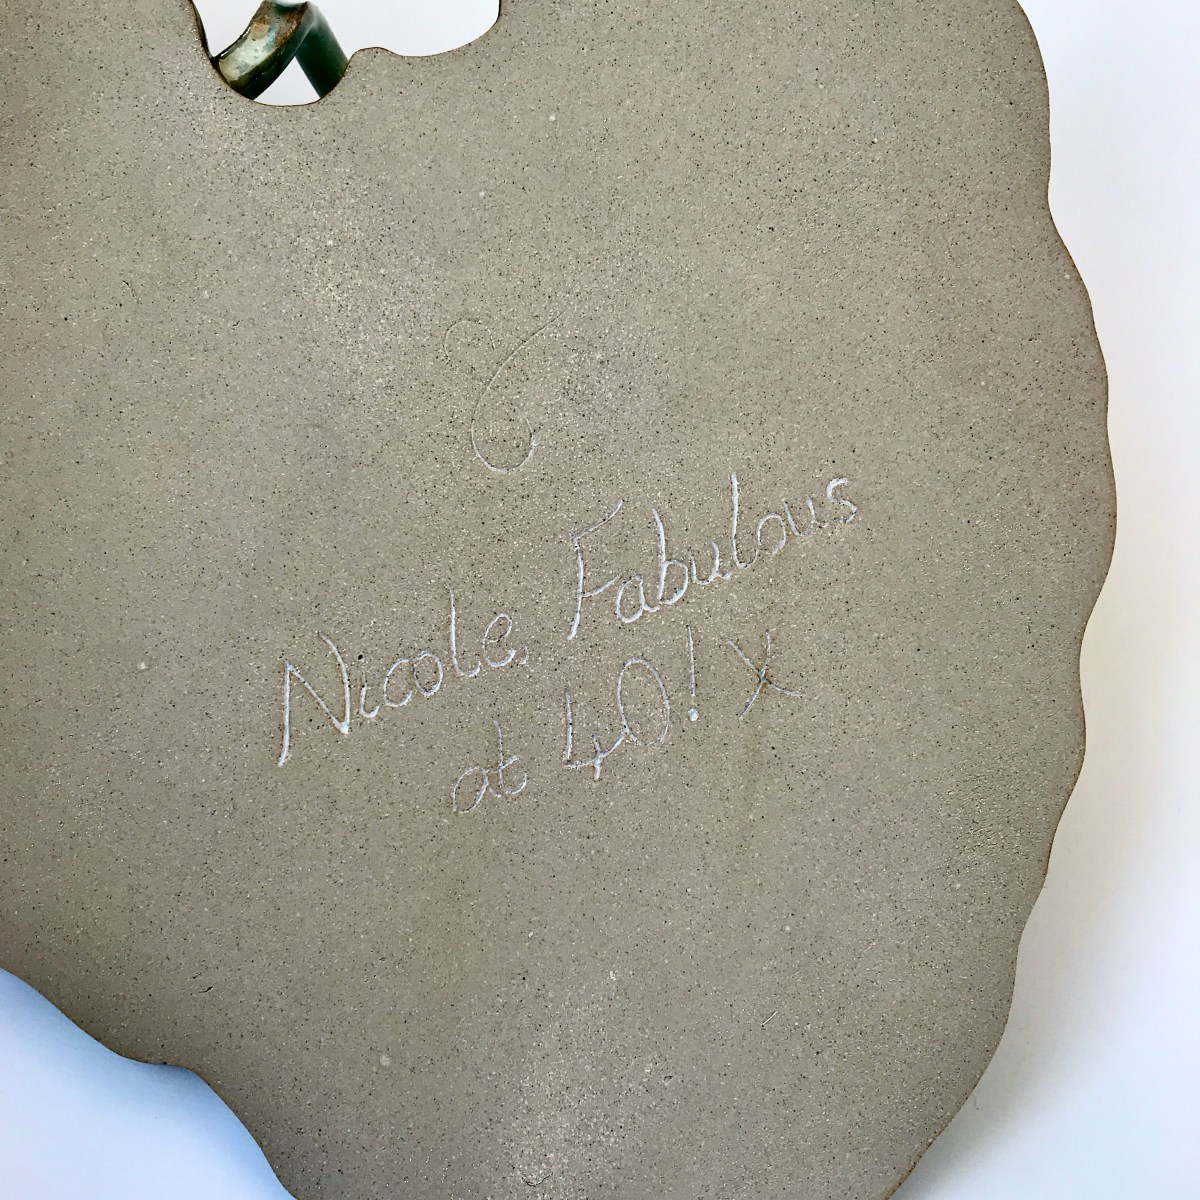 Personalised Burdock Leaf Sharing Platter by Sonya Ceramic Art (Fired)